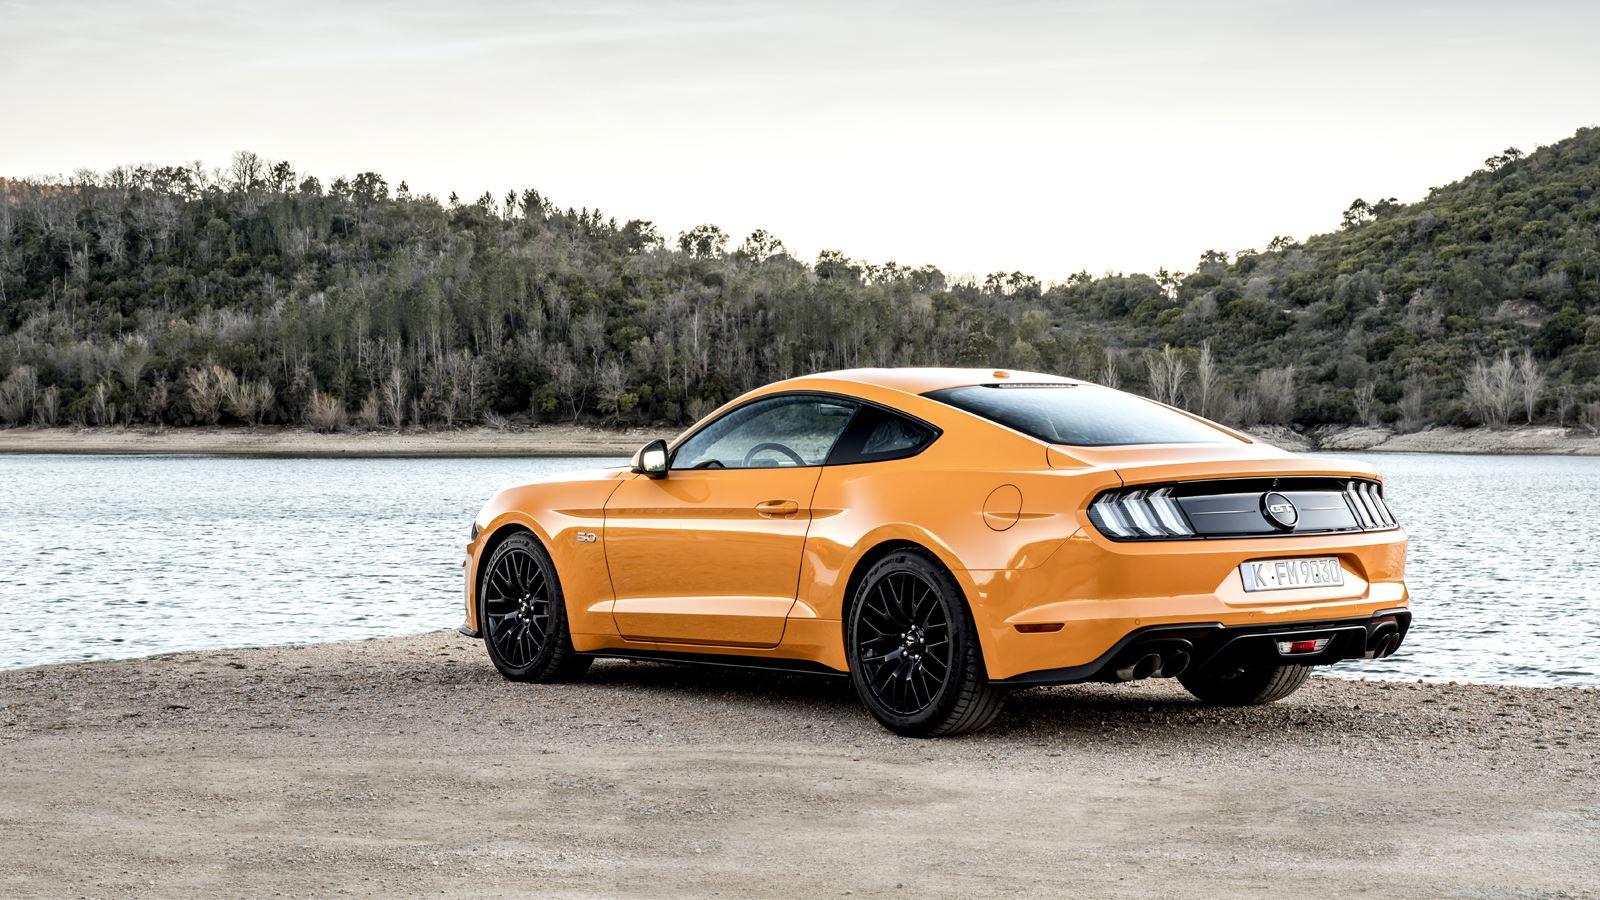 Ford Mustang de achterkant